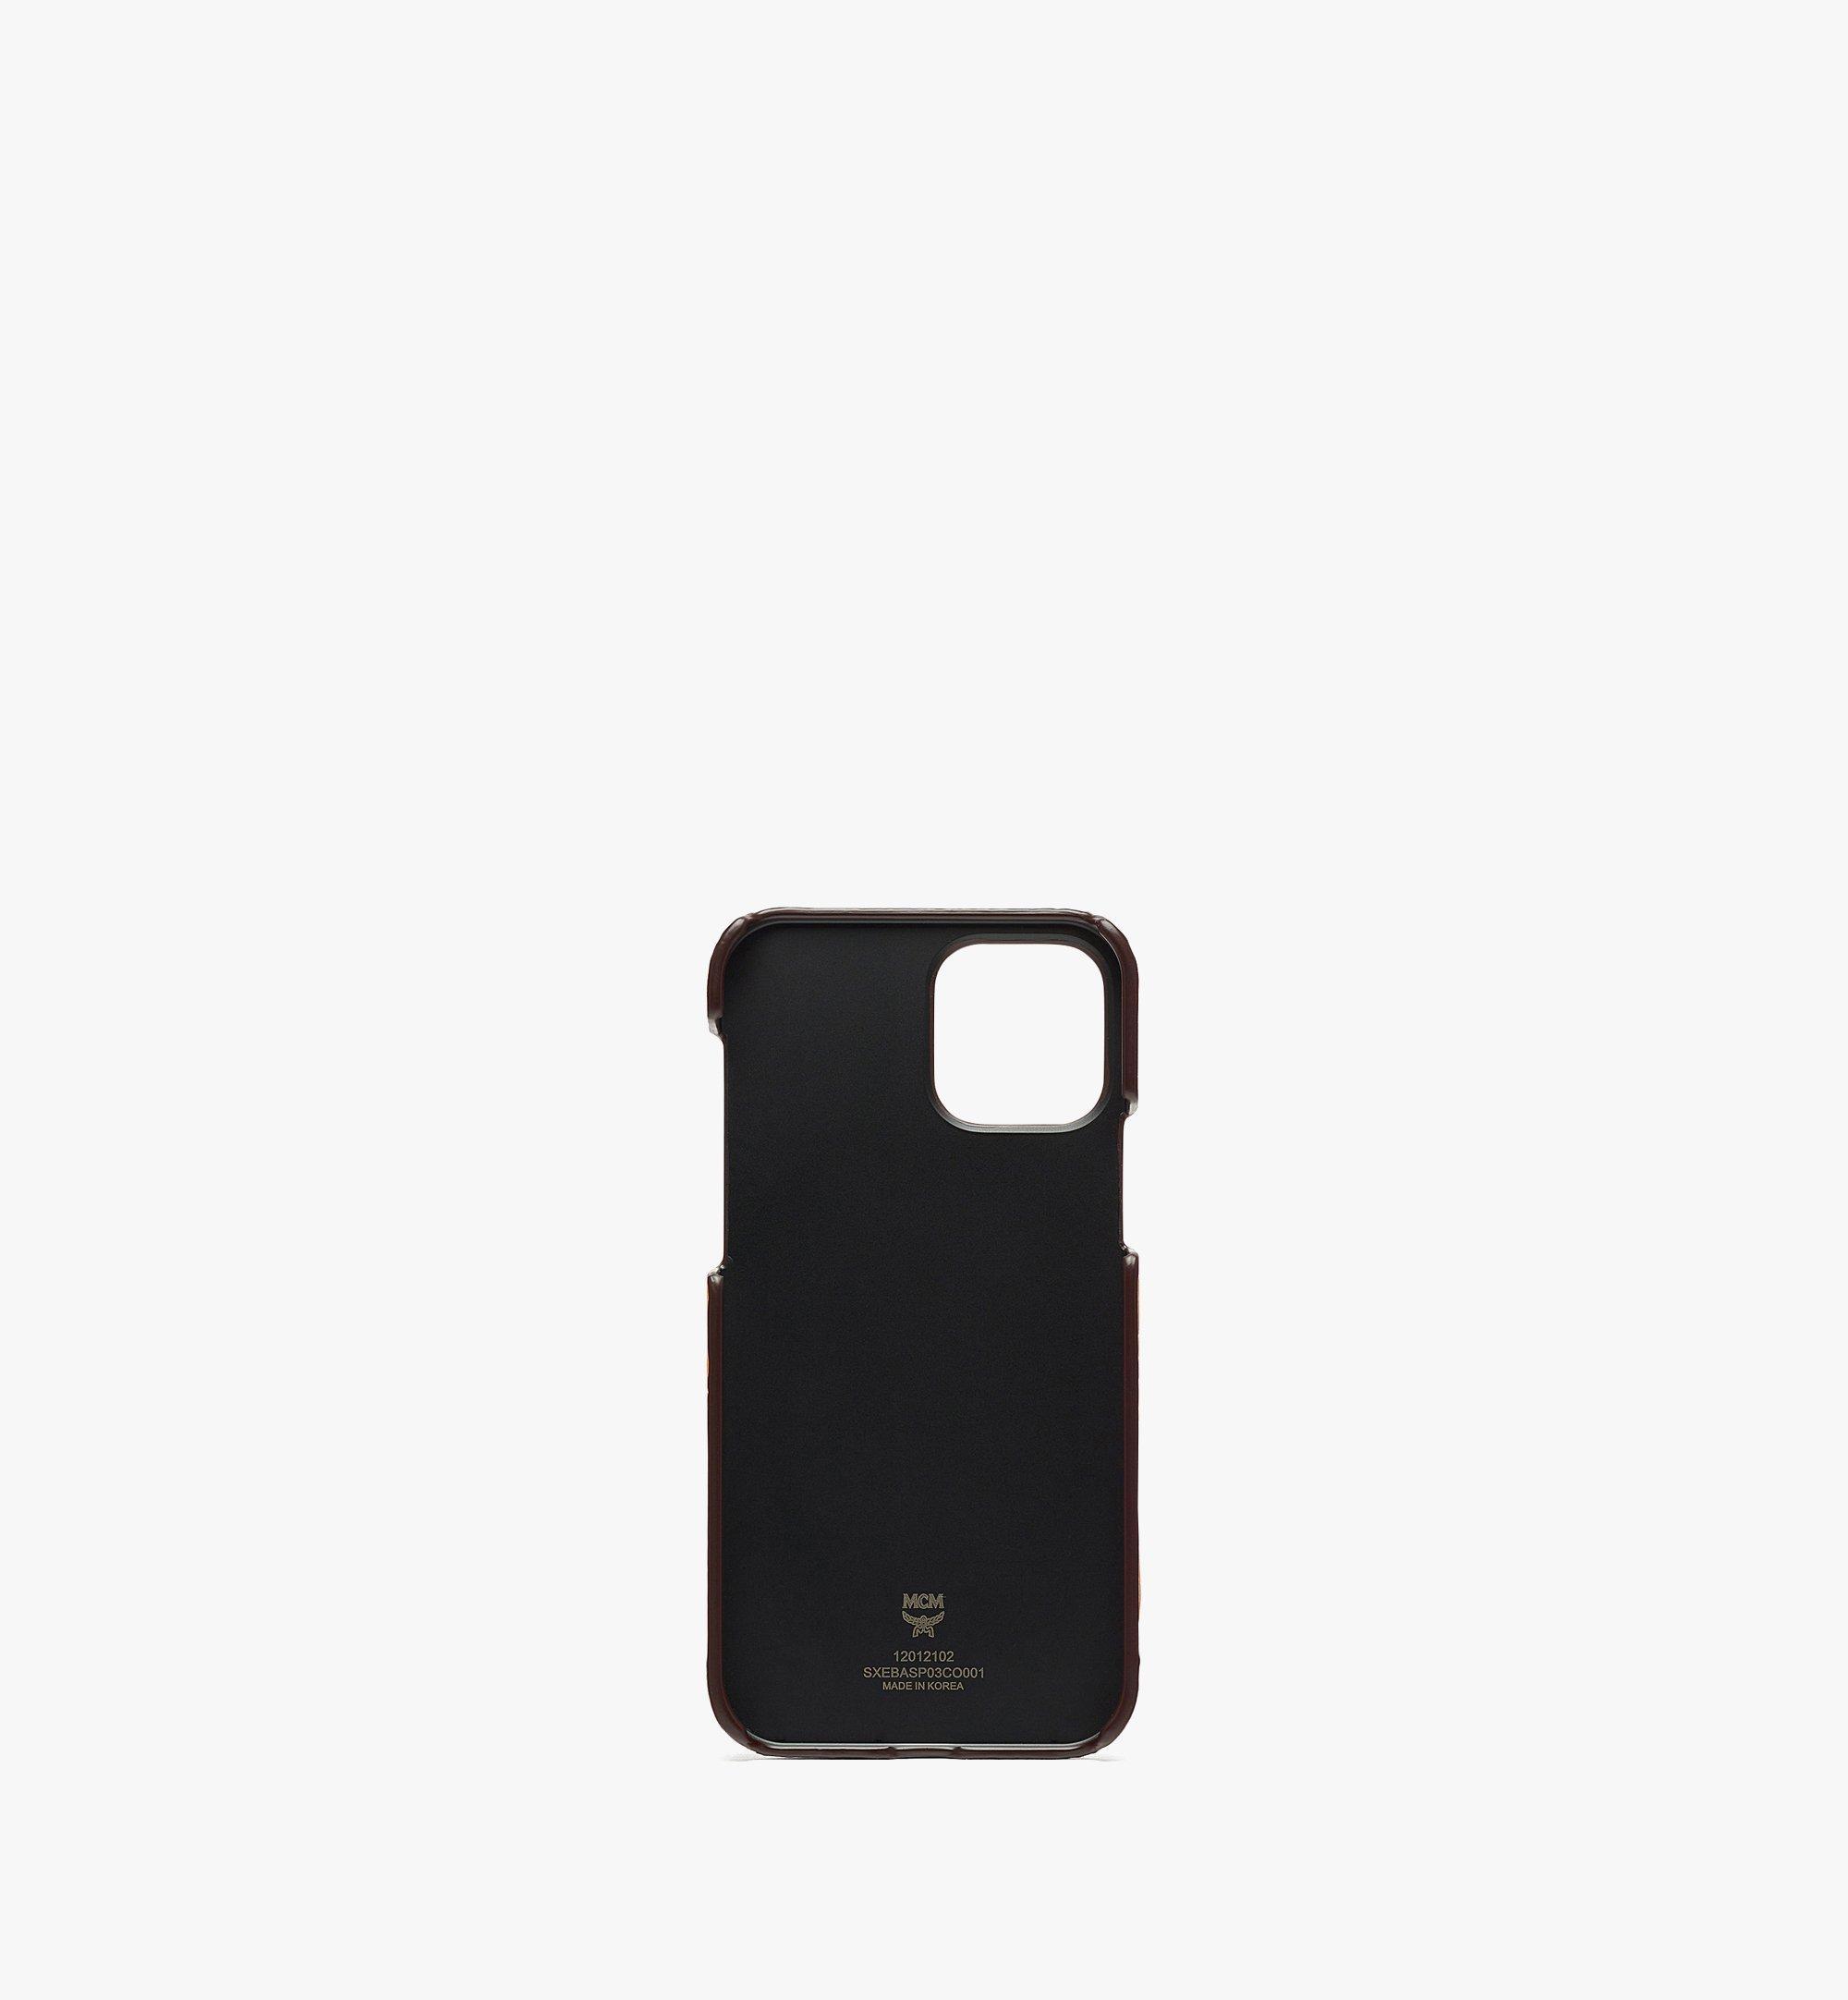 MCM MCM x SAMBYPEN iPhone 12/12 Pro Case in Visetos Cognac MXEBASP03CO001 Alternate View 1